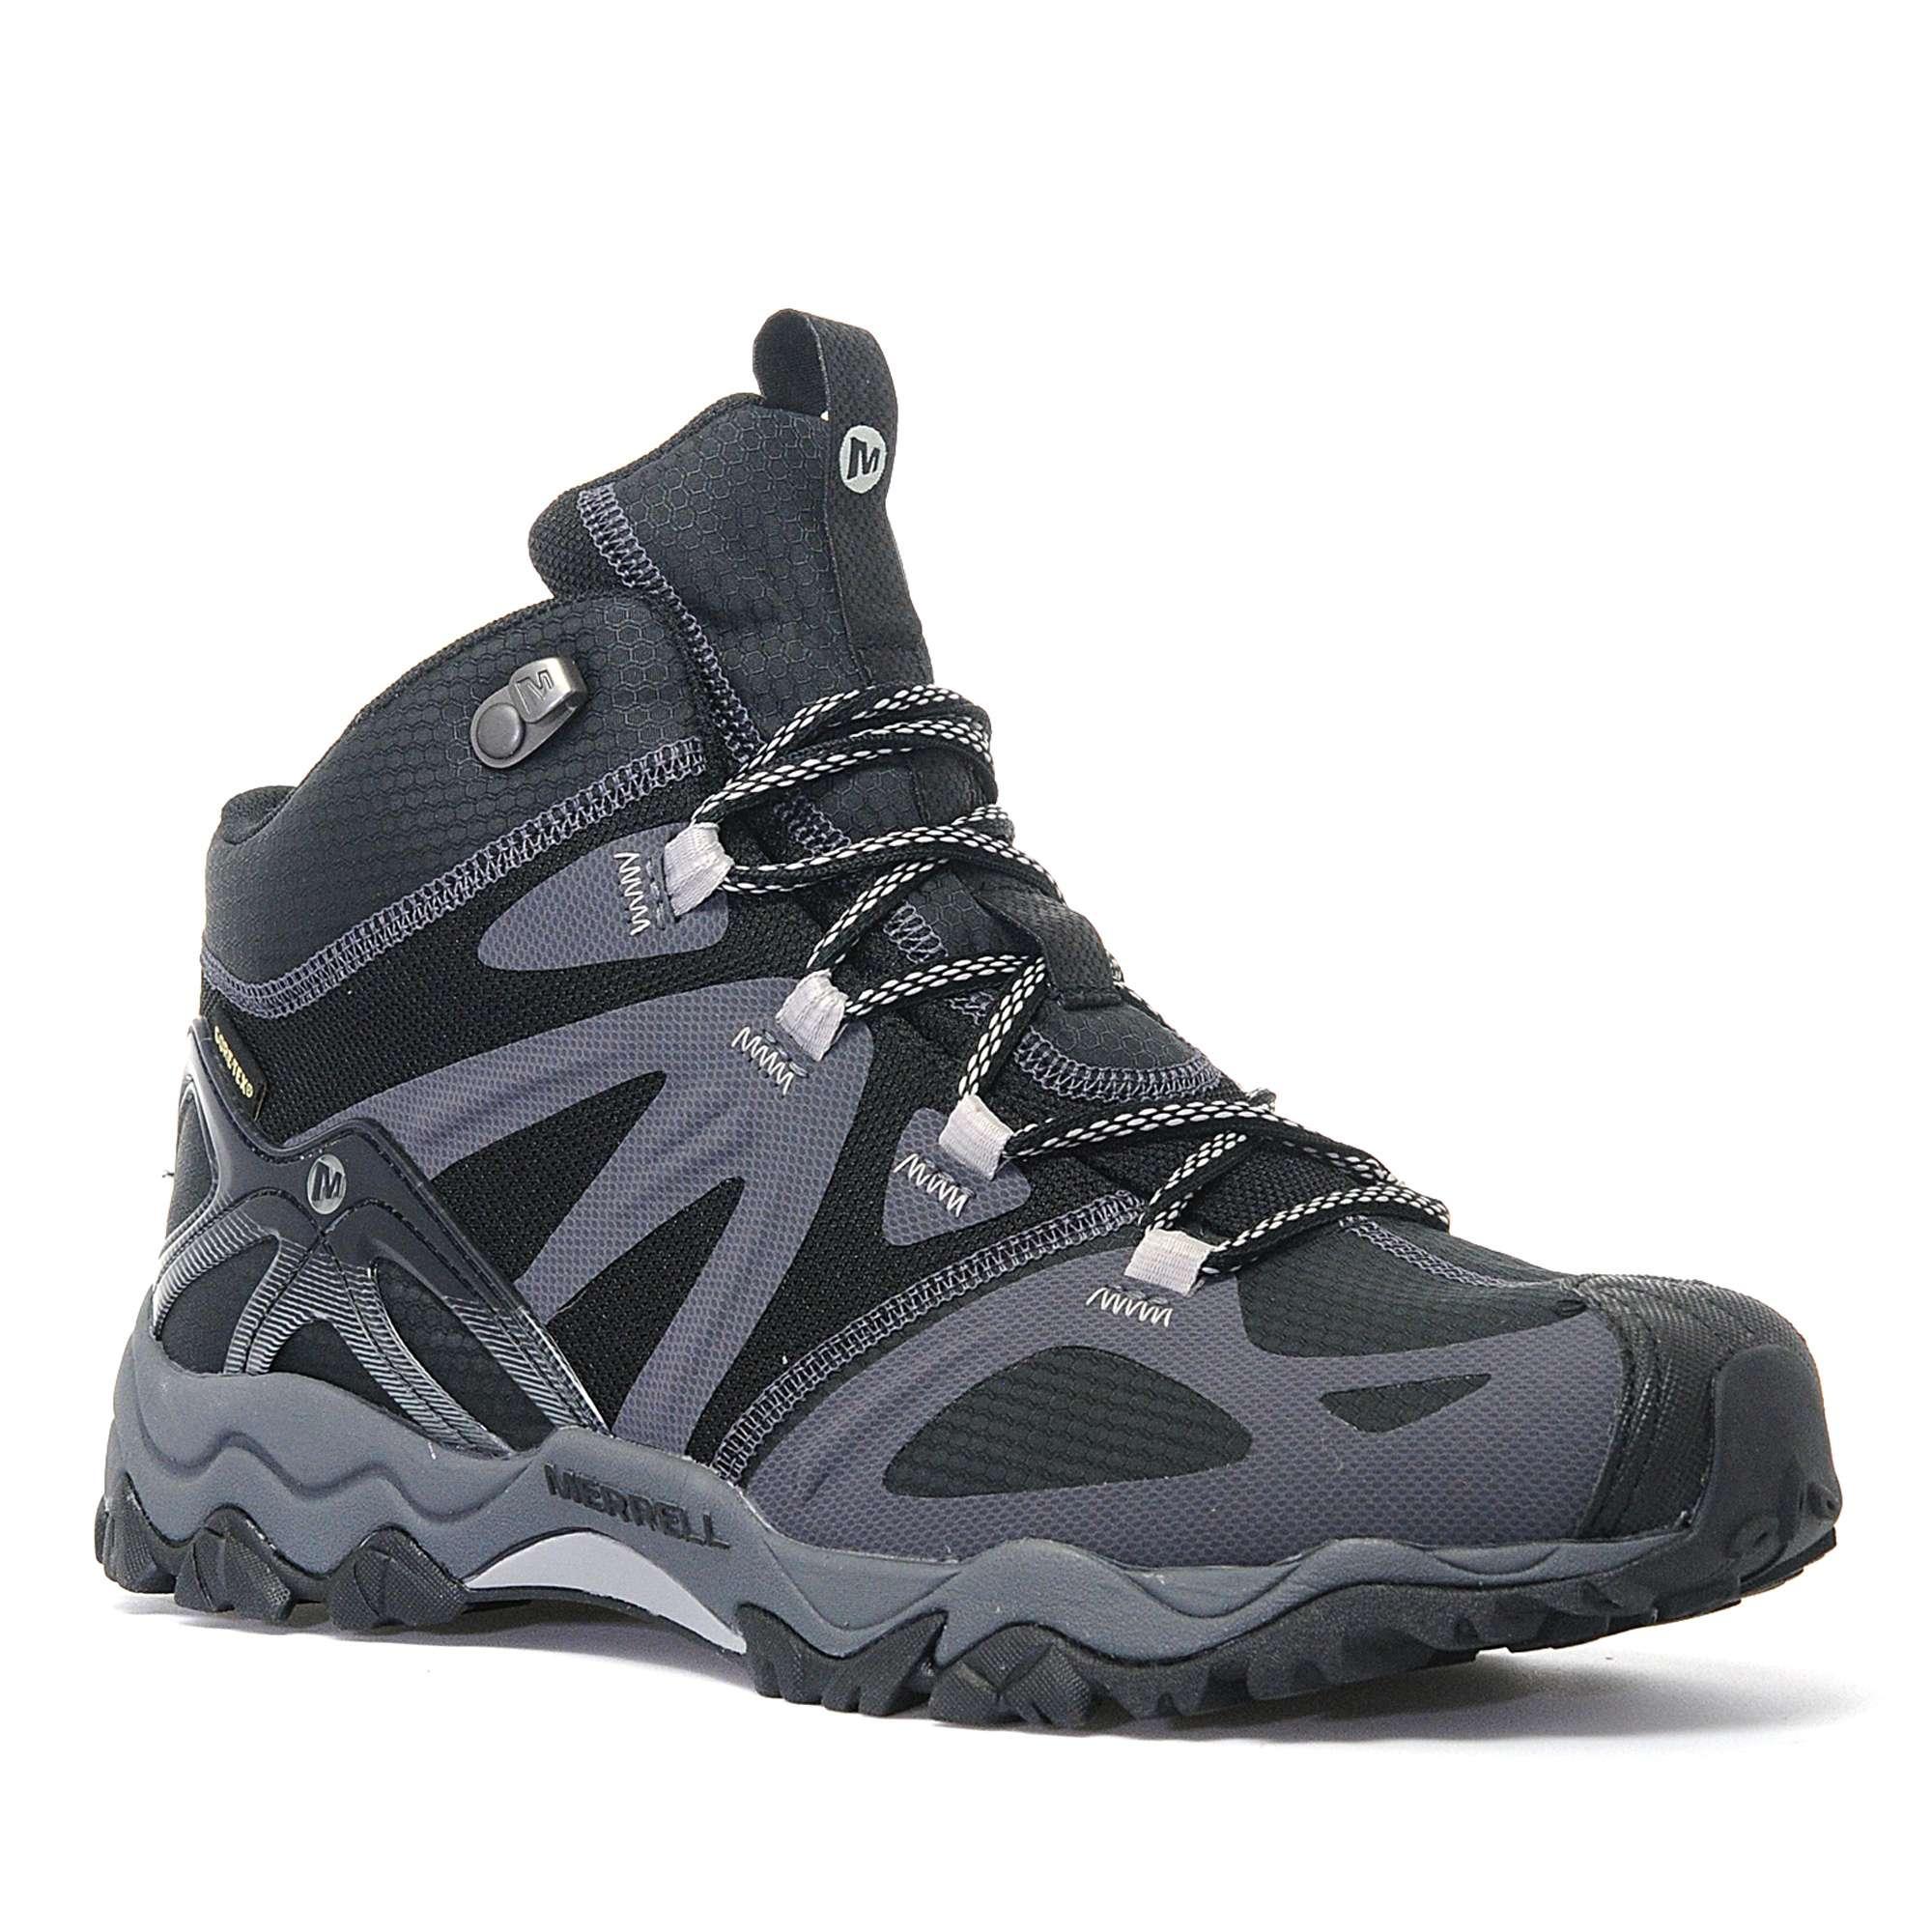 MERRELL Men's Grassbow Sport Mid GORE-TEX® Hiking Boot